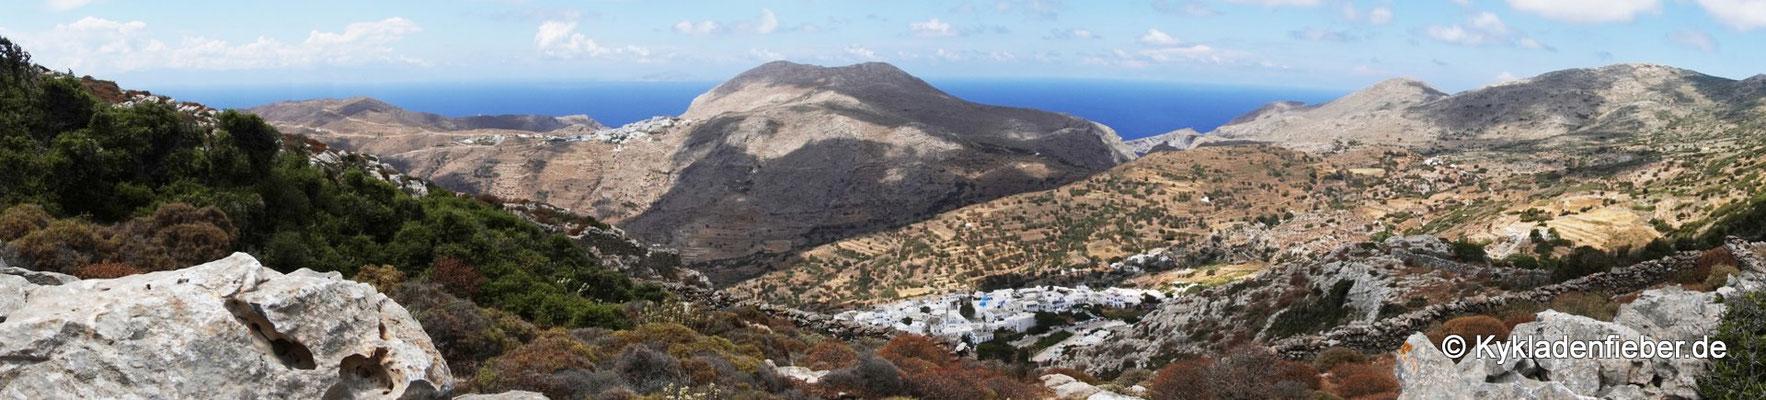 Amorgos, Blick auf Langada vom Wanderweg Nr. 9